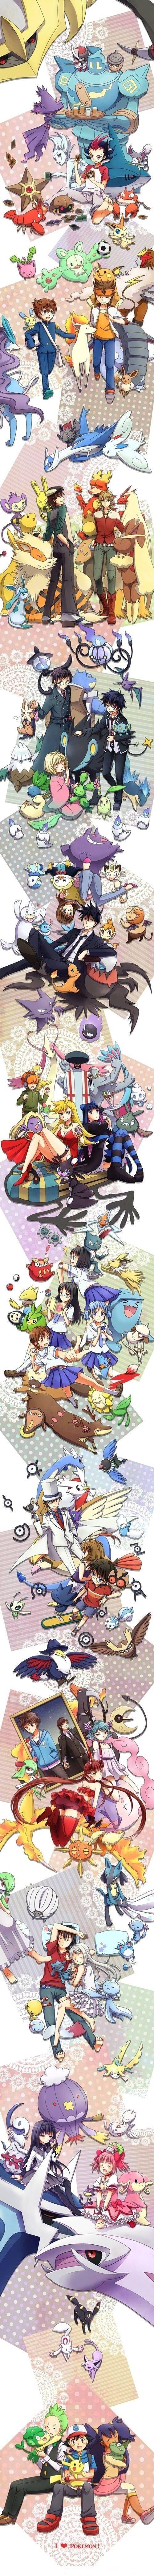 Pokémon anime - 8463132416